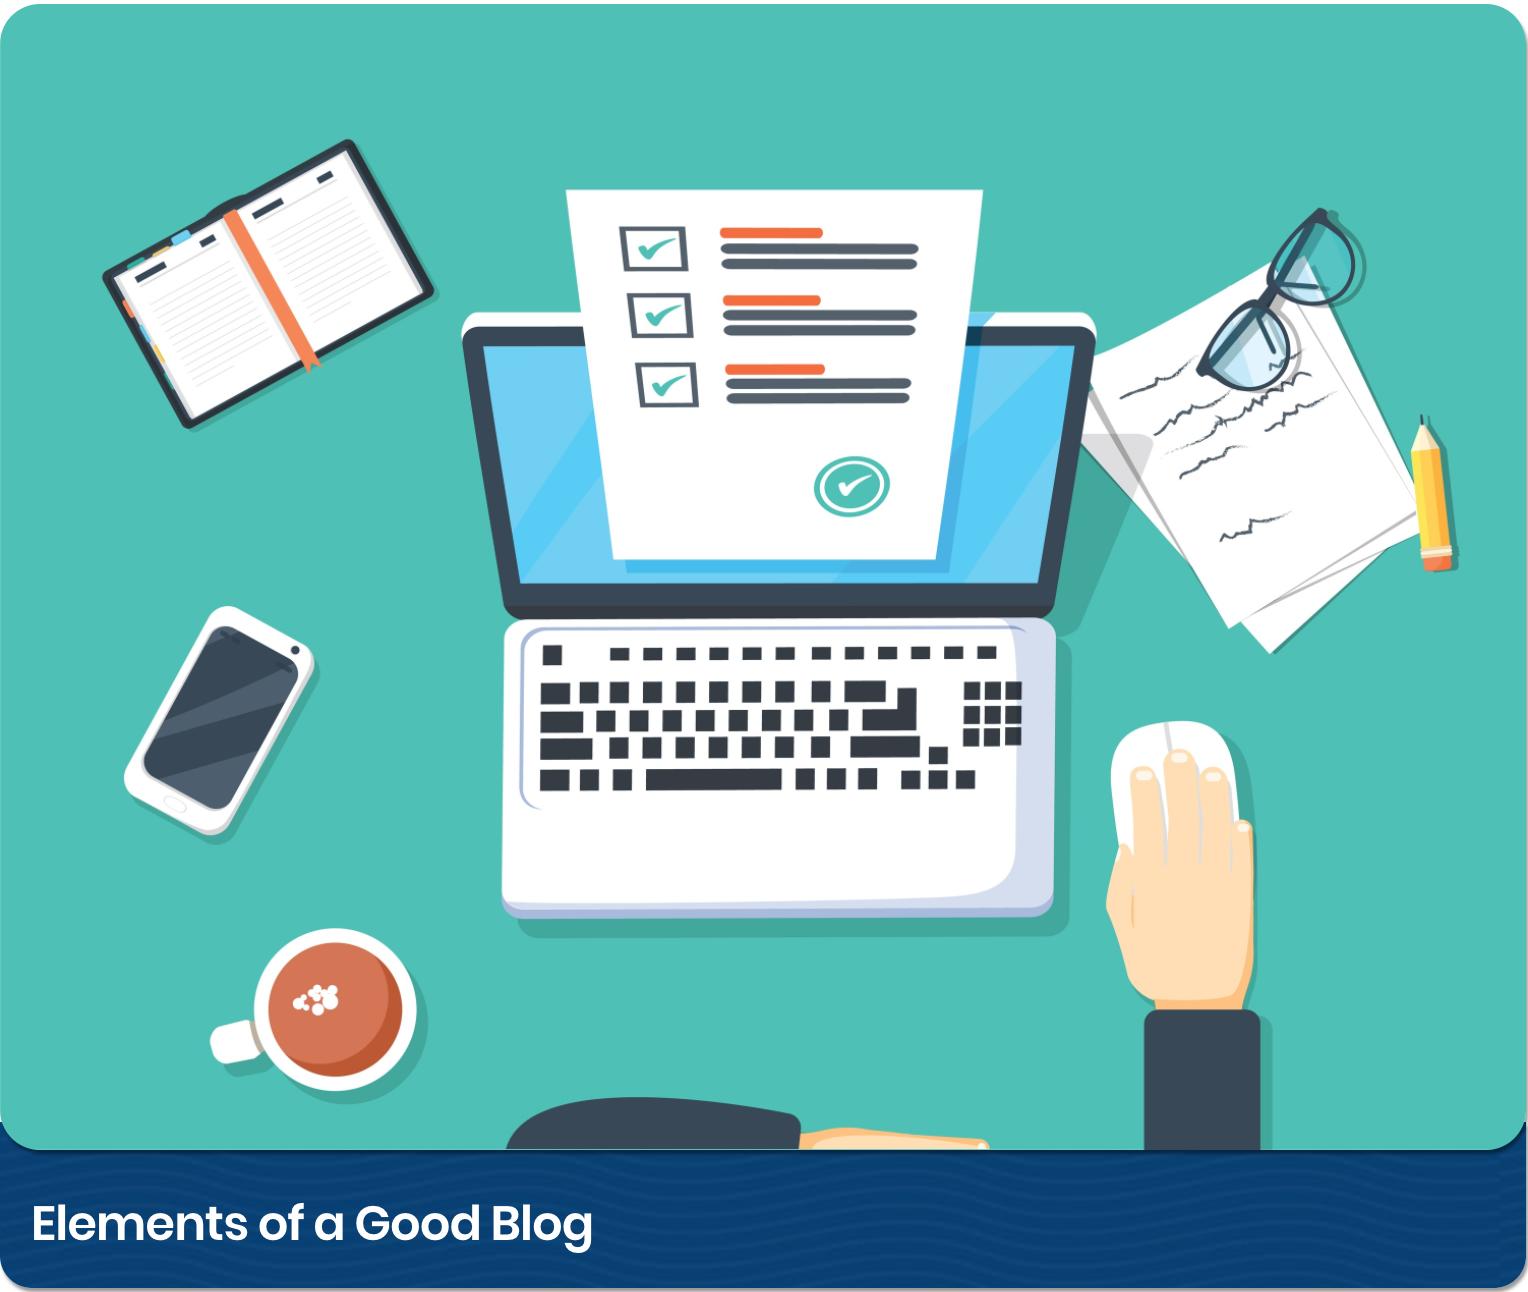 Elements_of_a_Good_Blog_Link